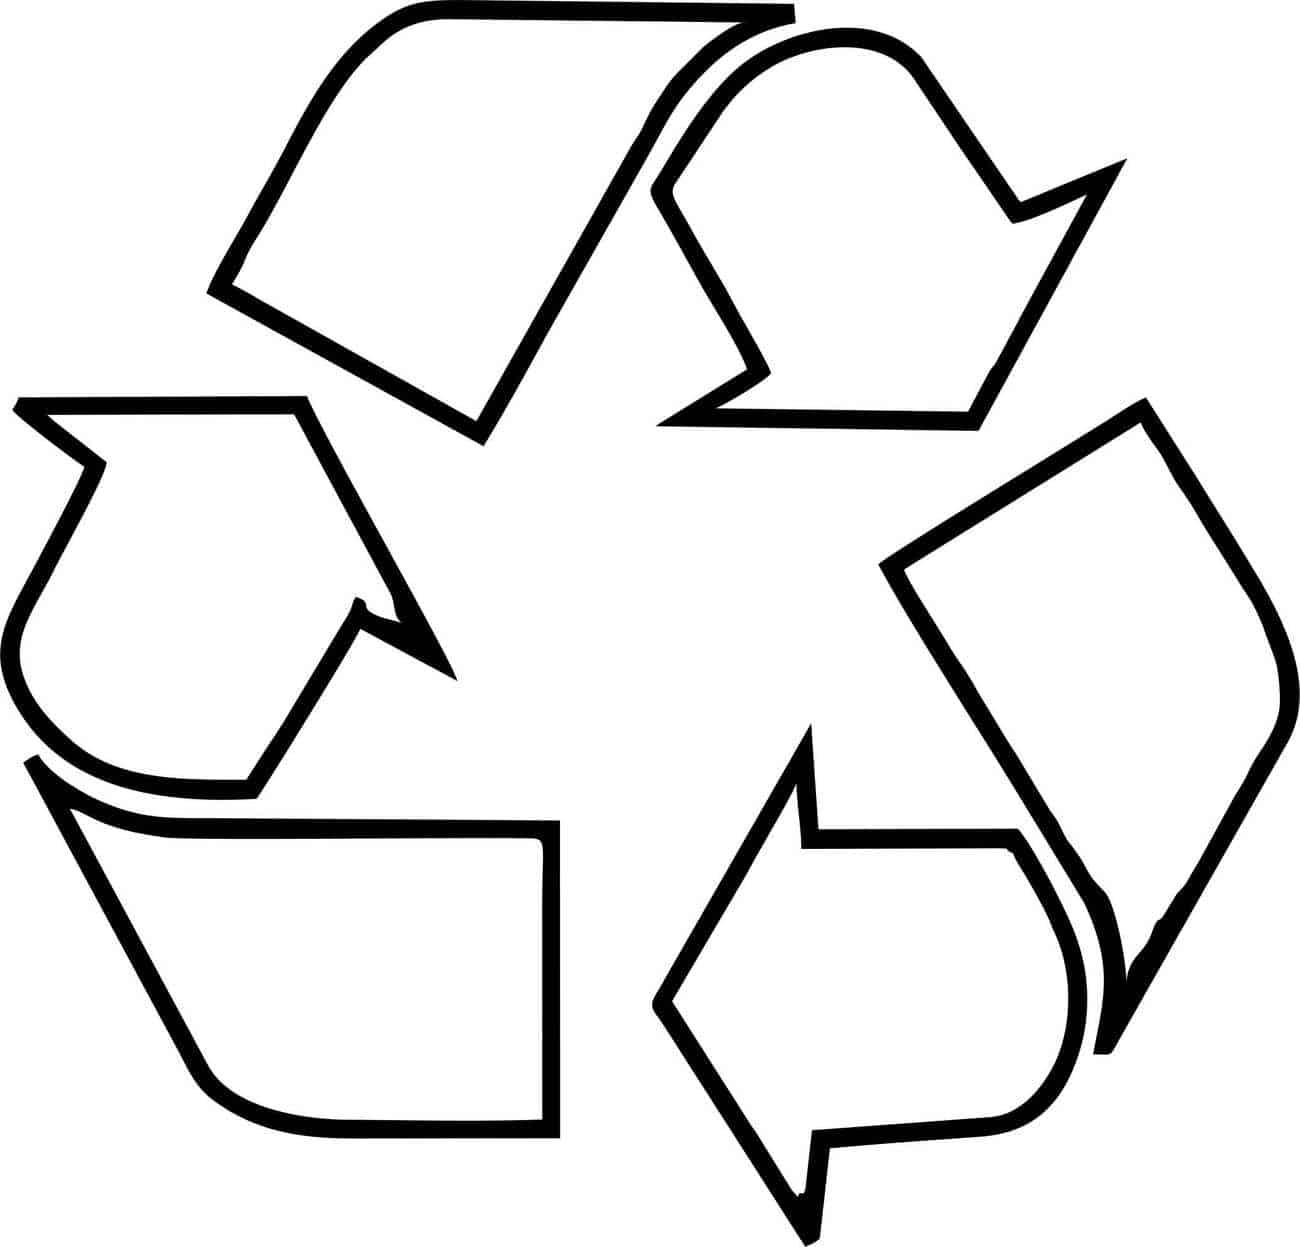 símbolo de reciclaje para colorear infantil